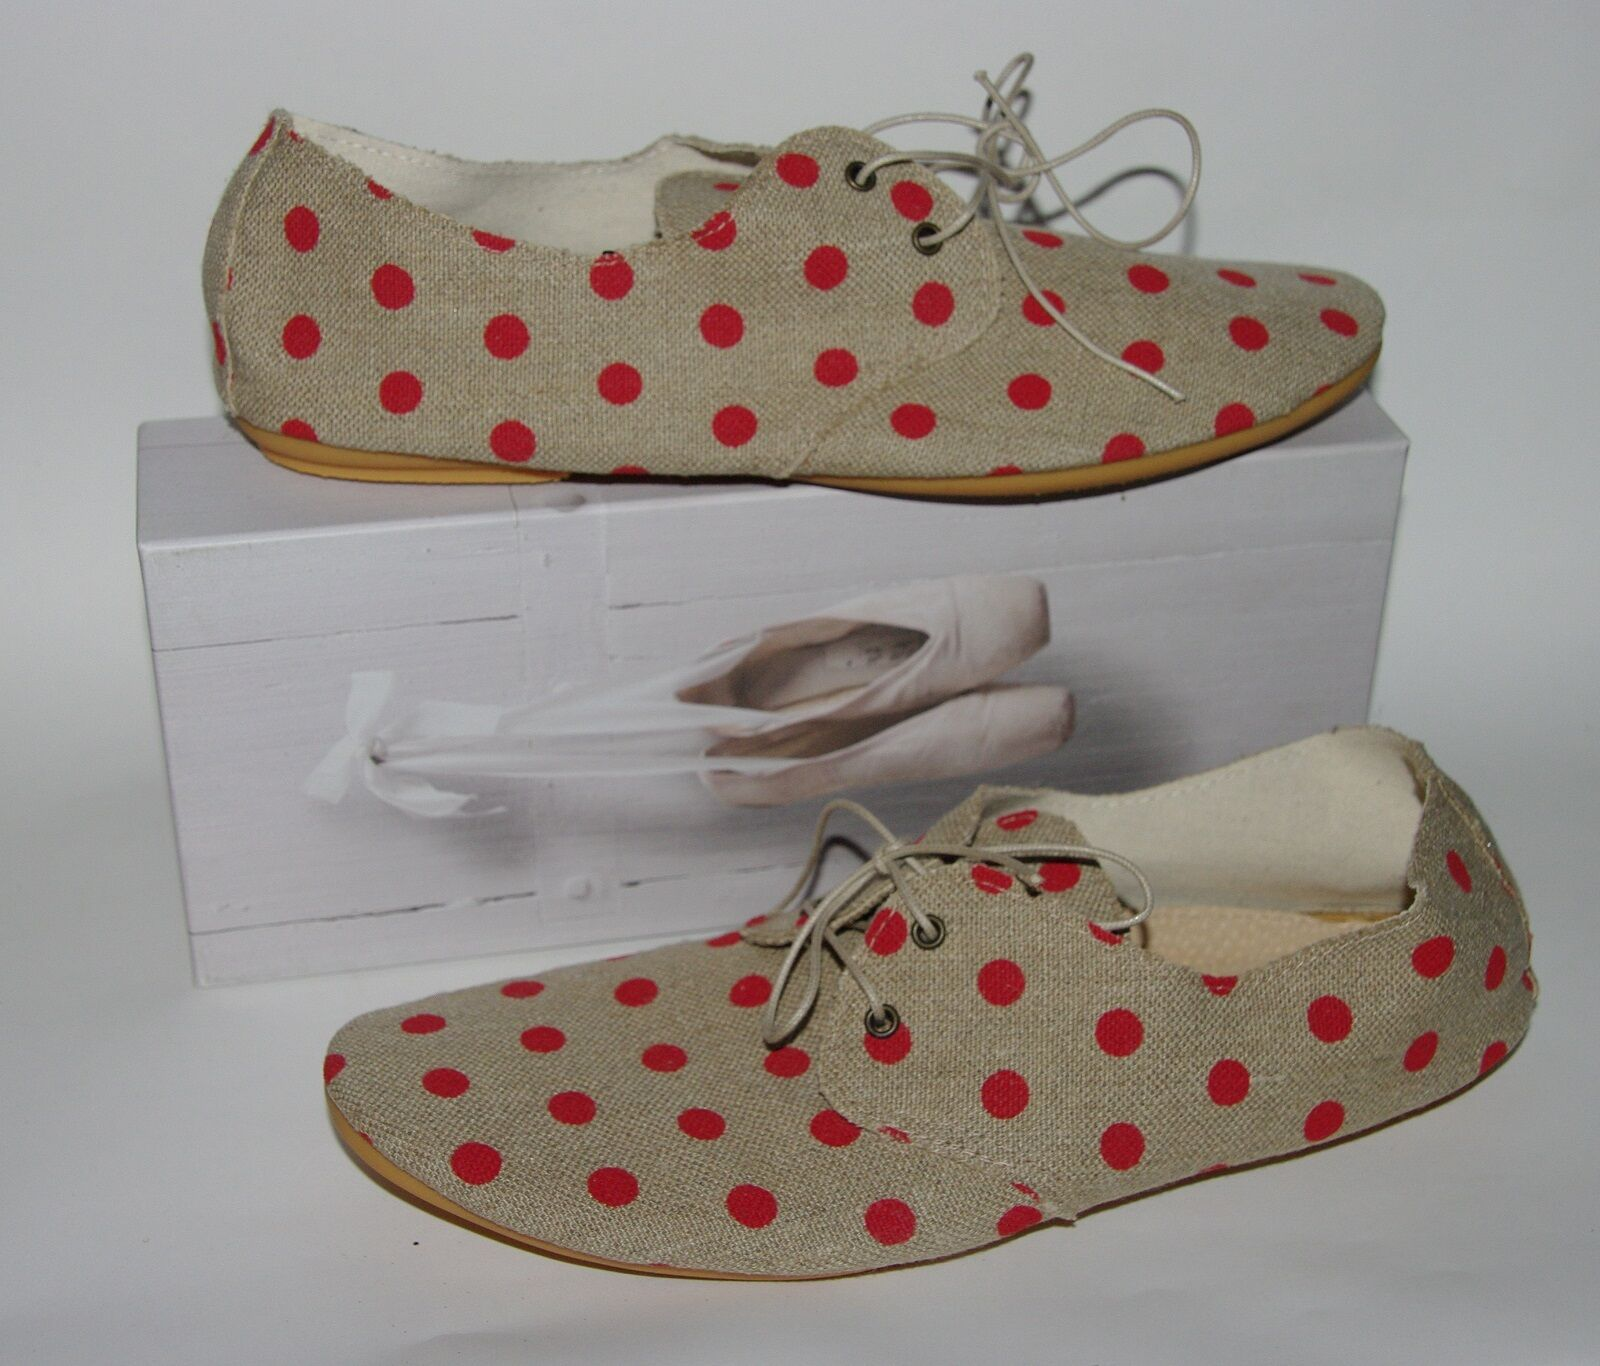 NEU 110 Anniel Ballet Derby Schuhes   9.5US/40 EU 10US/41EU